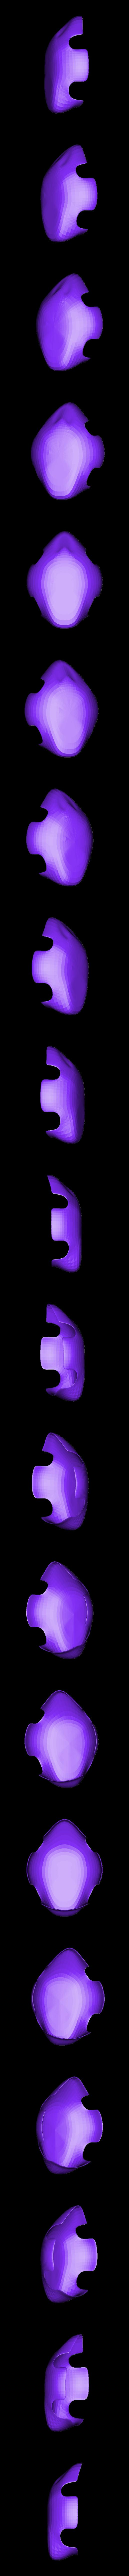 spiderhead_6.stl Télécharger fichier STL gratuit WLtoys v262-v666 FrankenSpider Canopy • Objet pour imprimante 3D, Thomllama